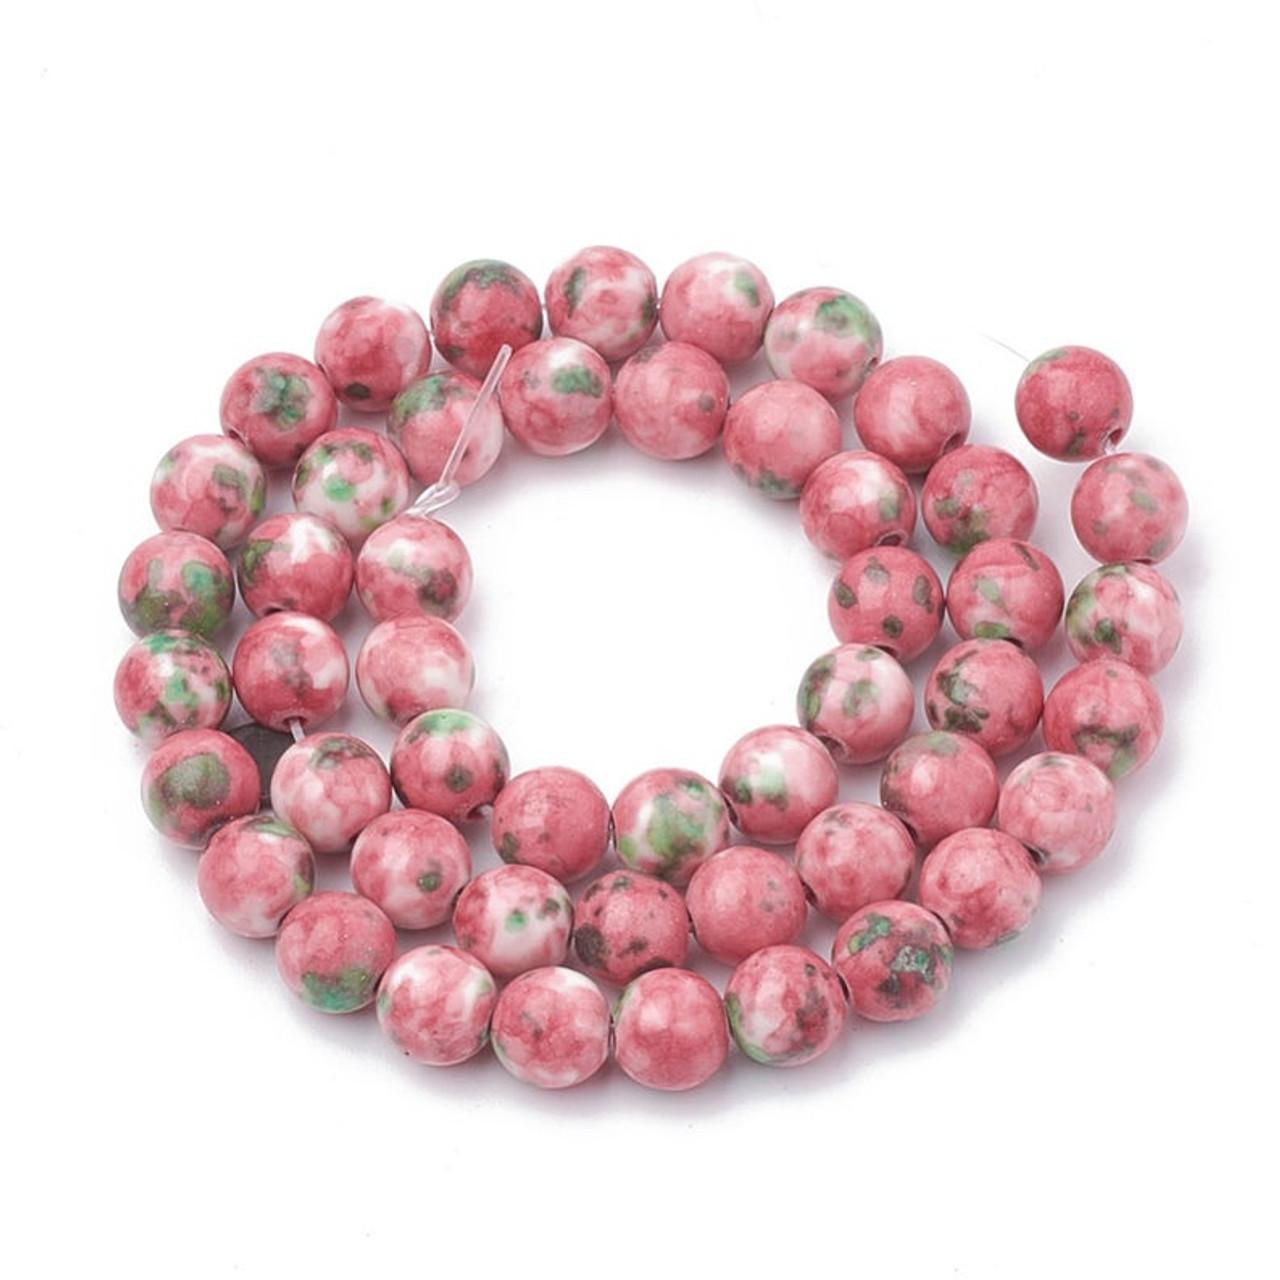 30 Pcs Pink /& Gray 10mm Round Dyed Jade Beads